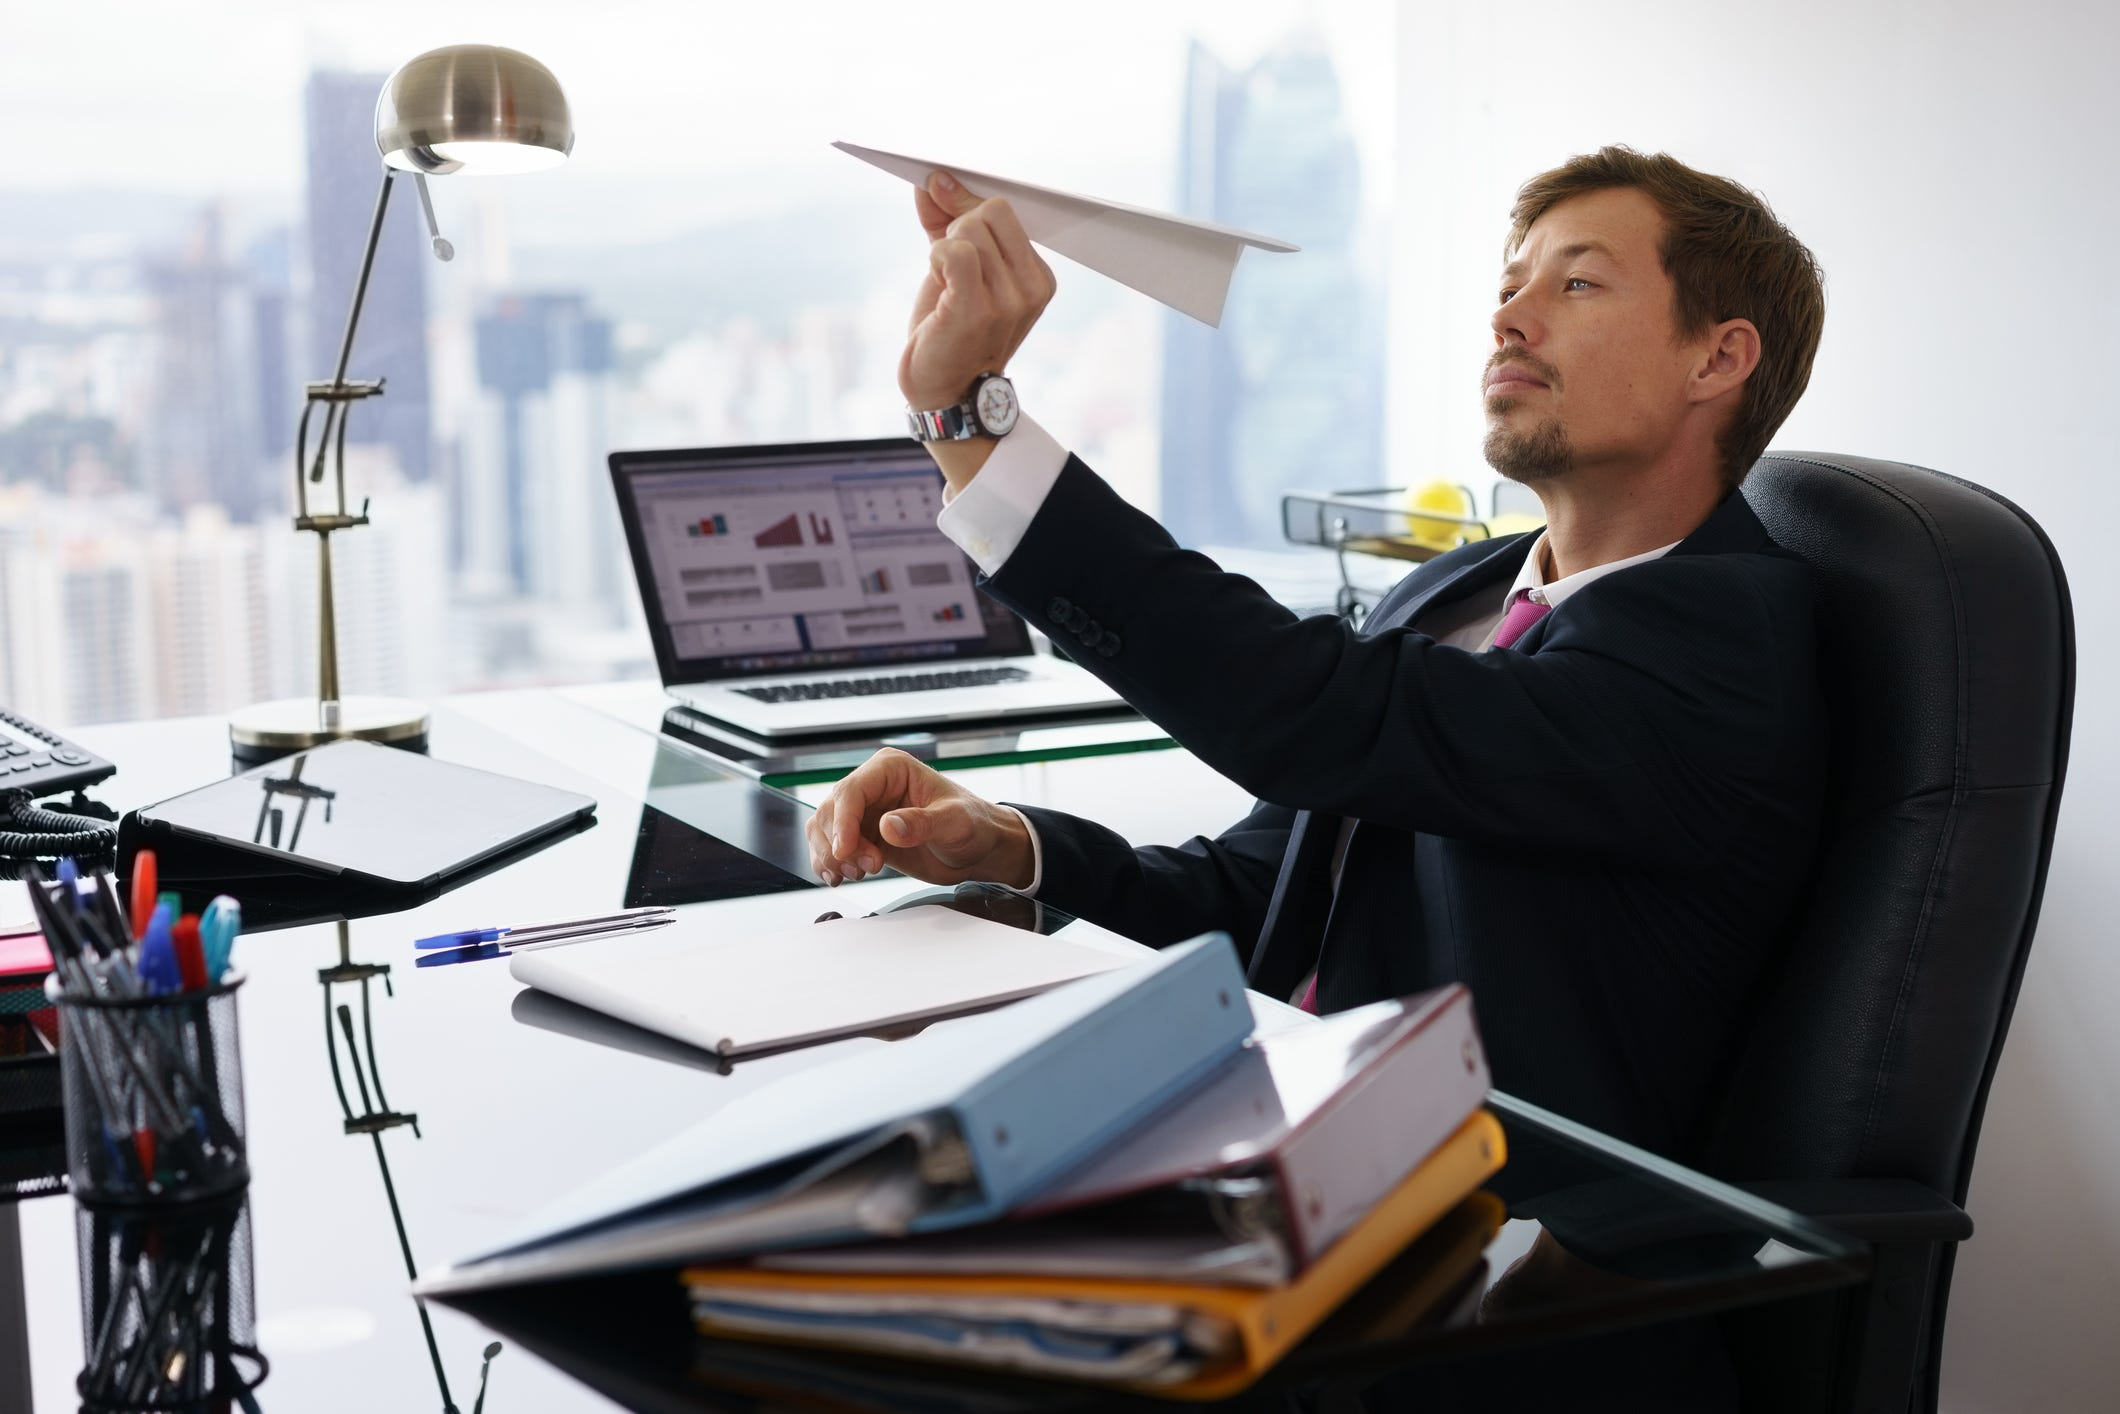 Time's up for tax extension procrastinators: Deadline Oct. 17